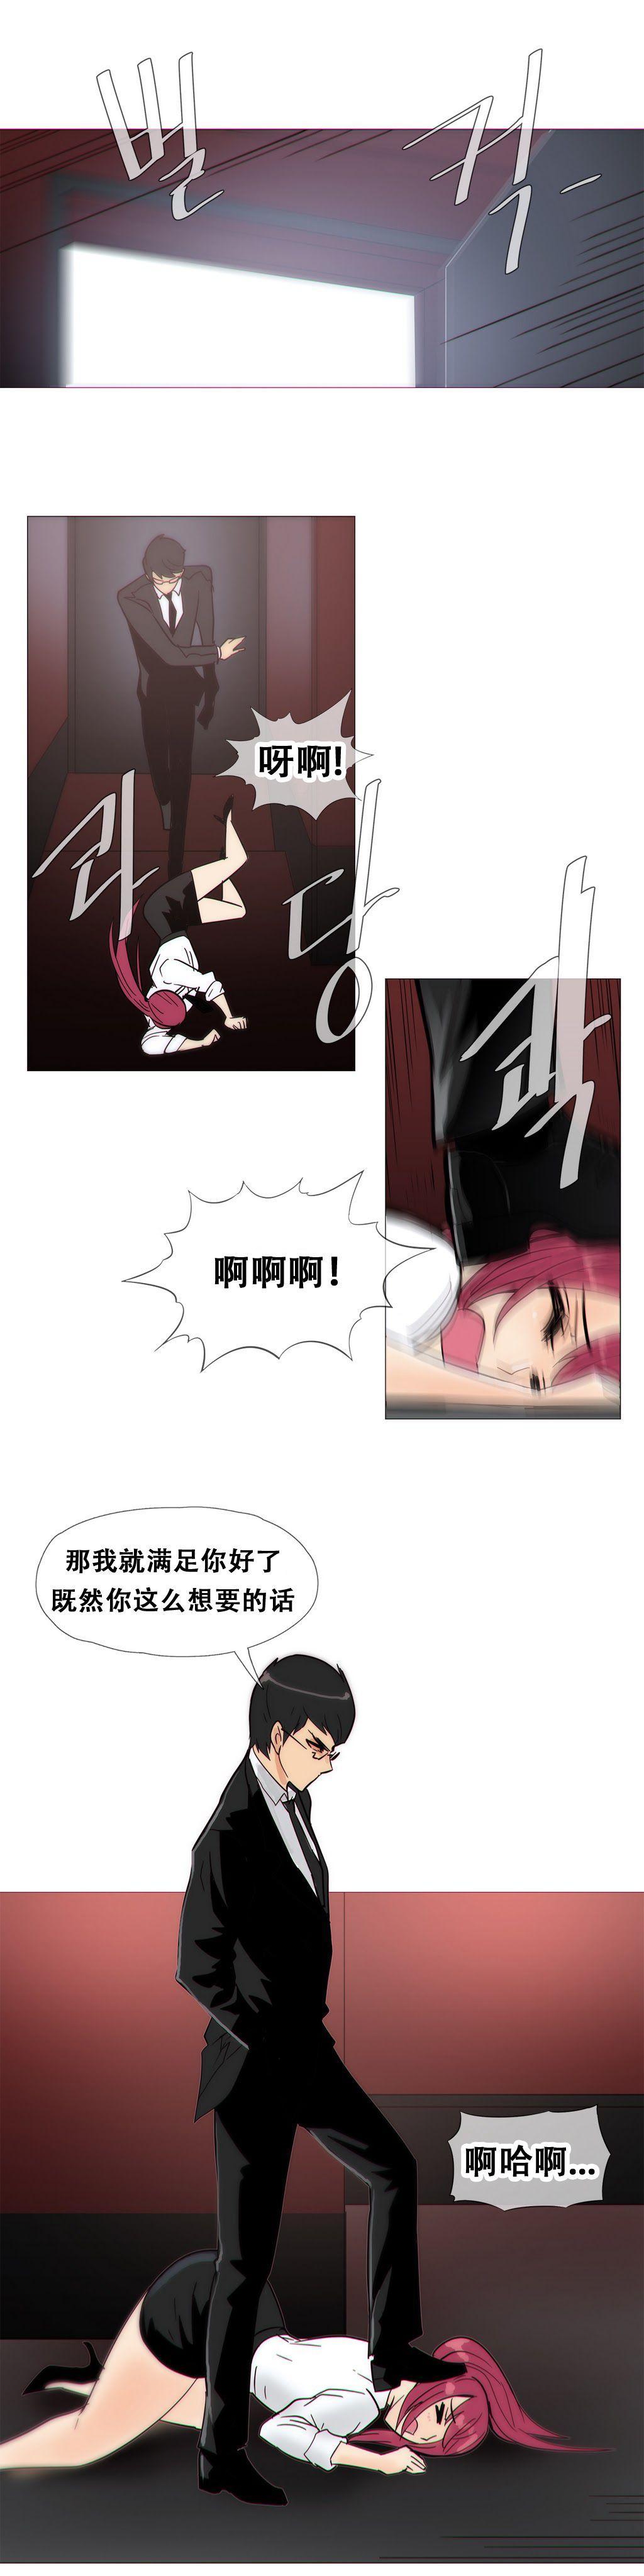 HouseHold Affairs 【卞赤鲤个人汉化】1~21话(持续更新中) 315